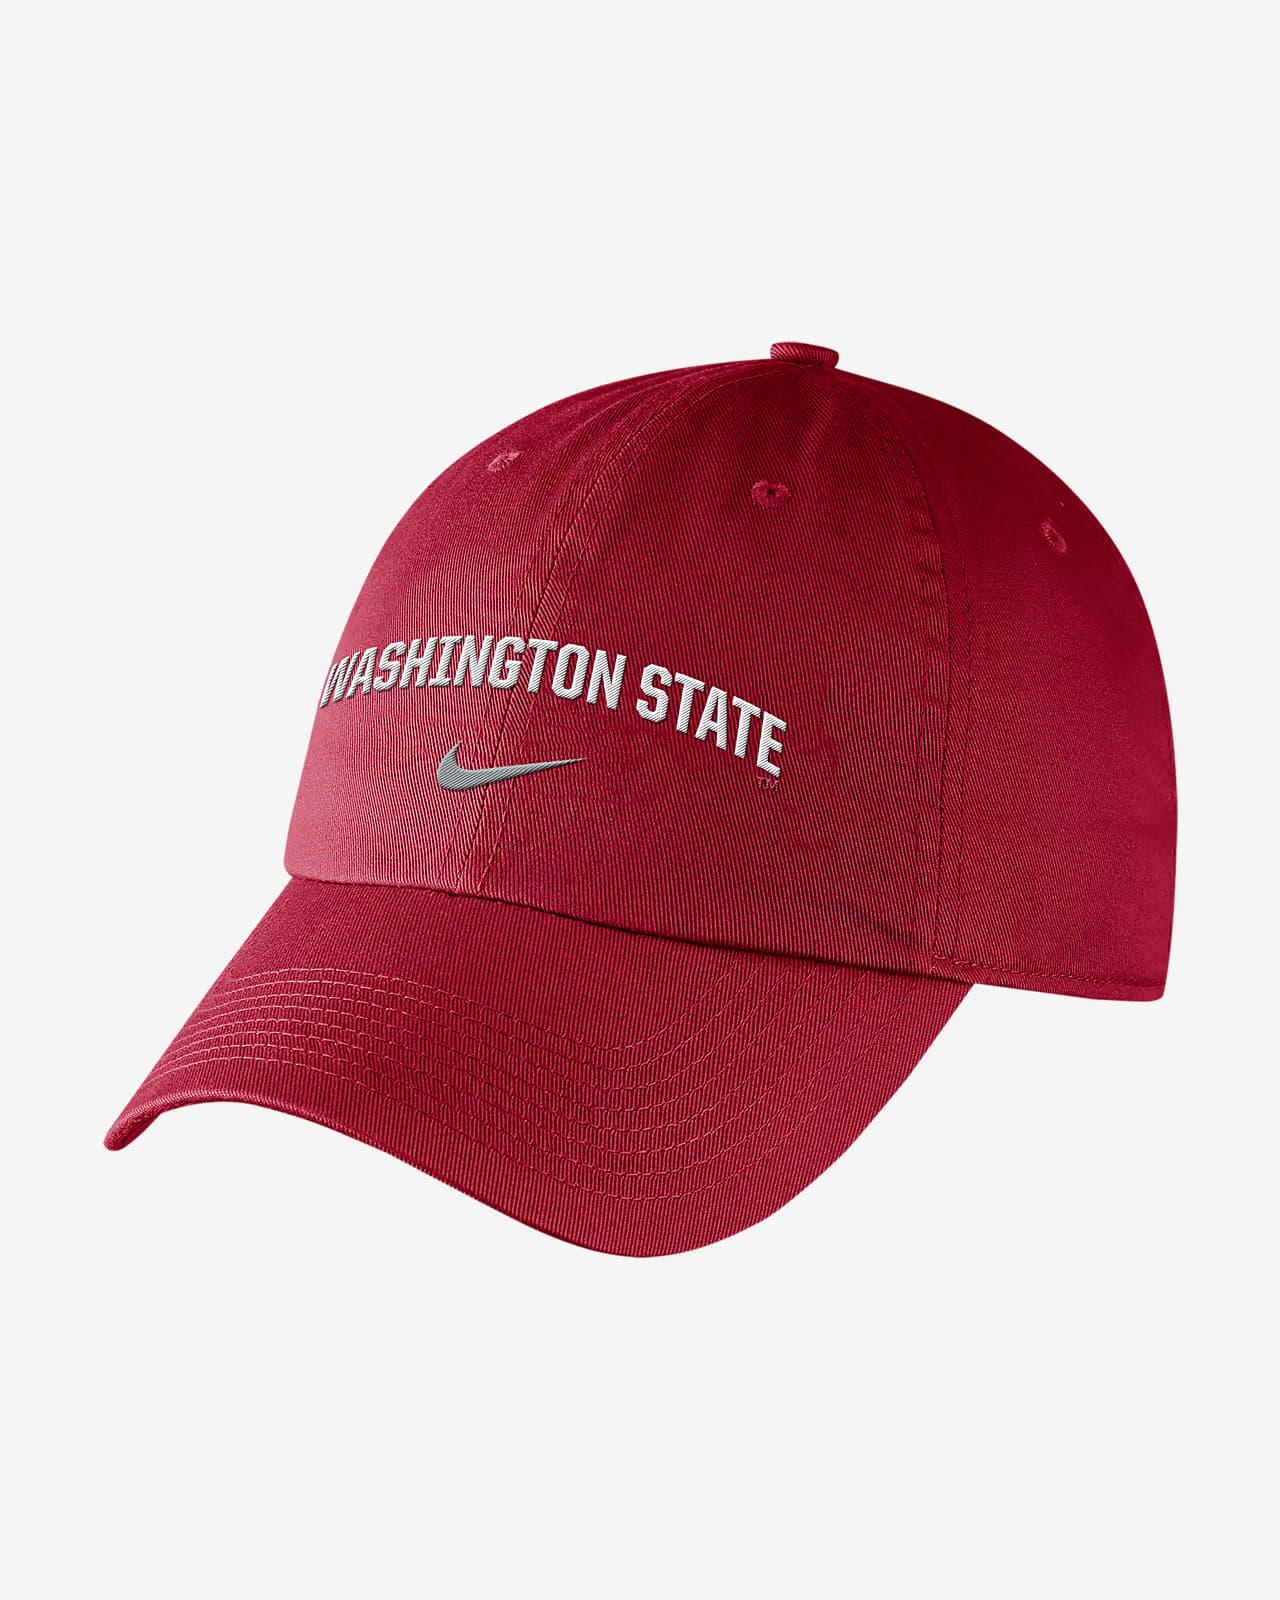 Nike College (Washington State) Hat